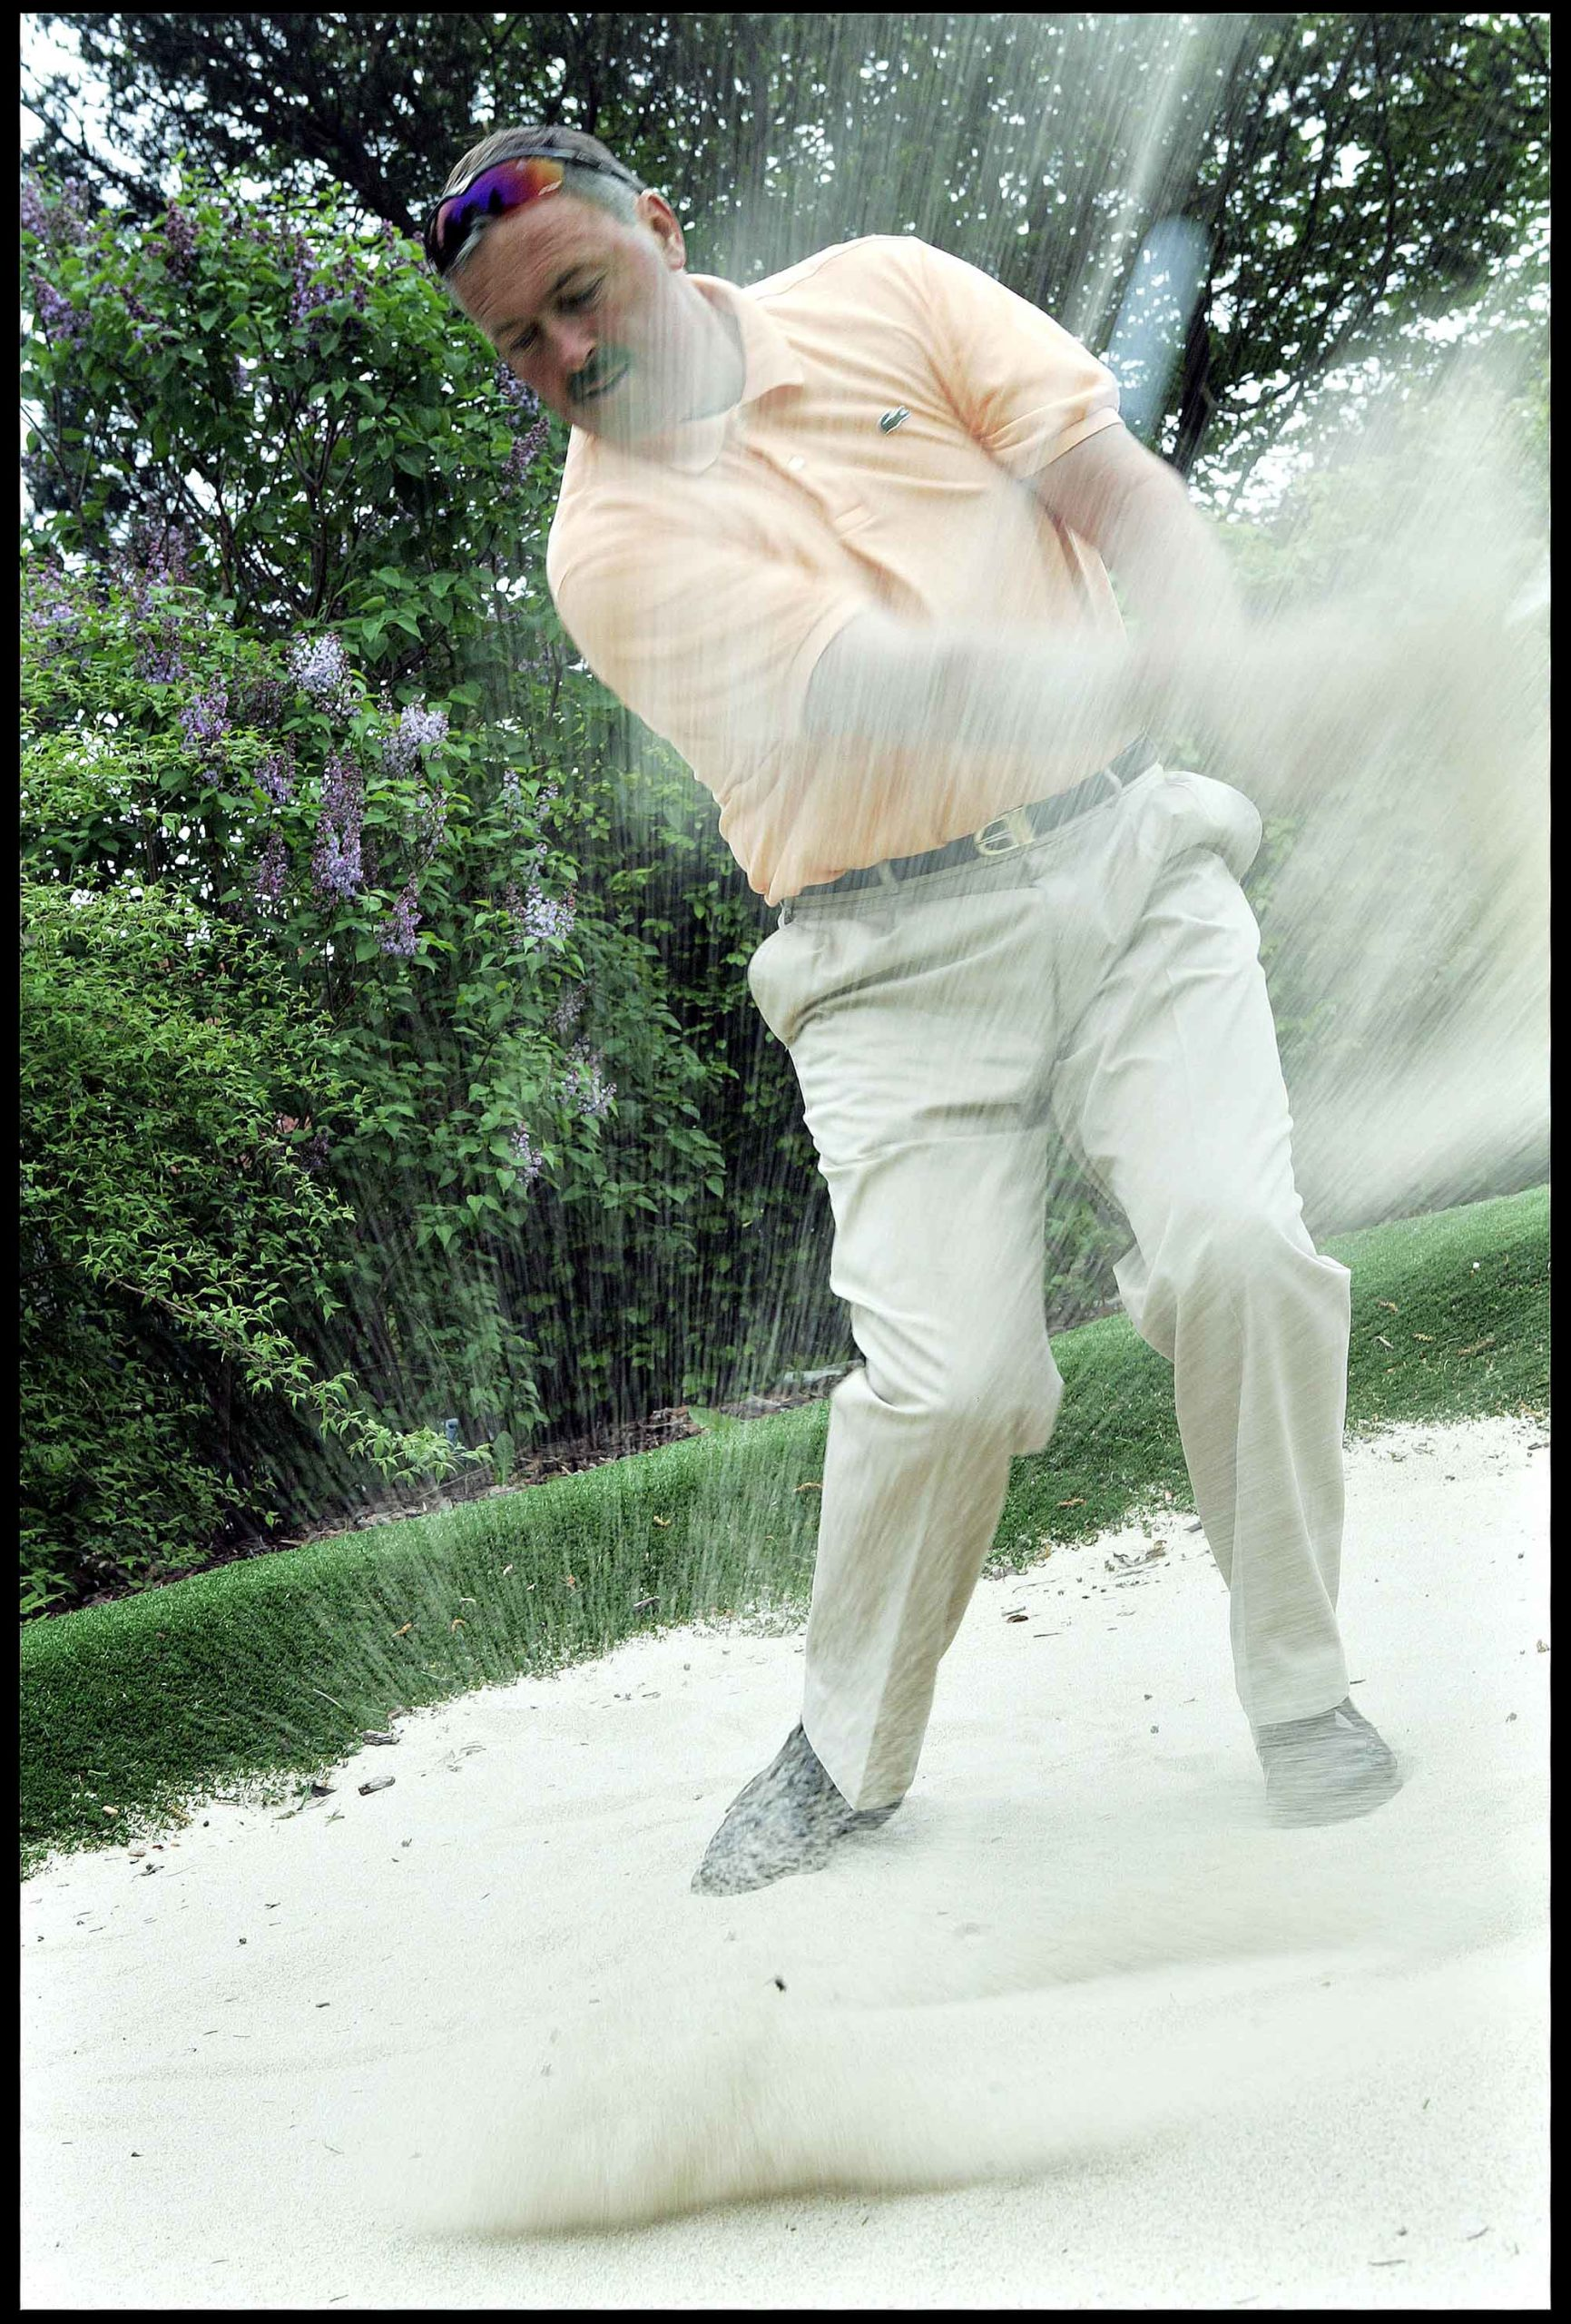 Professionelle golfspiller Leif Nyholm